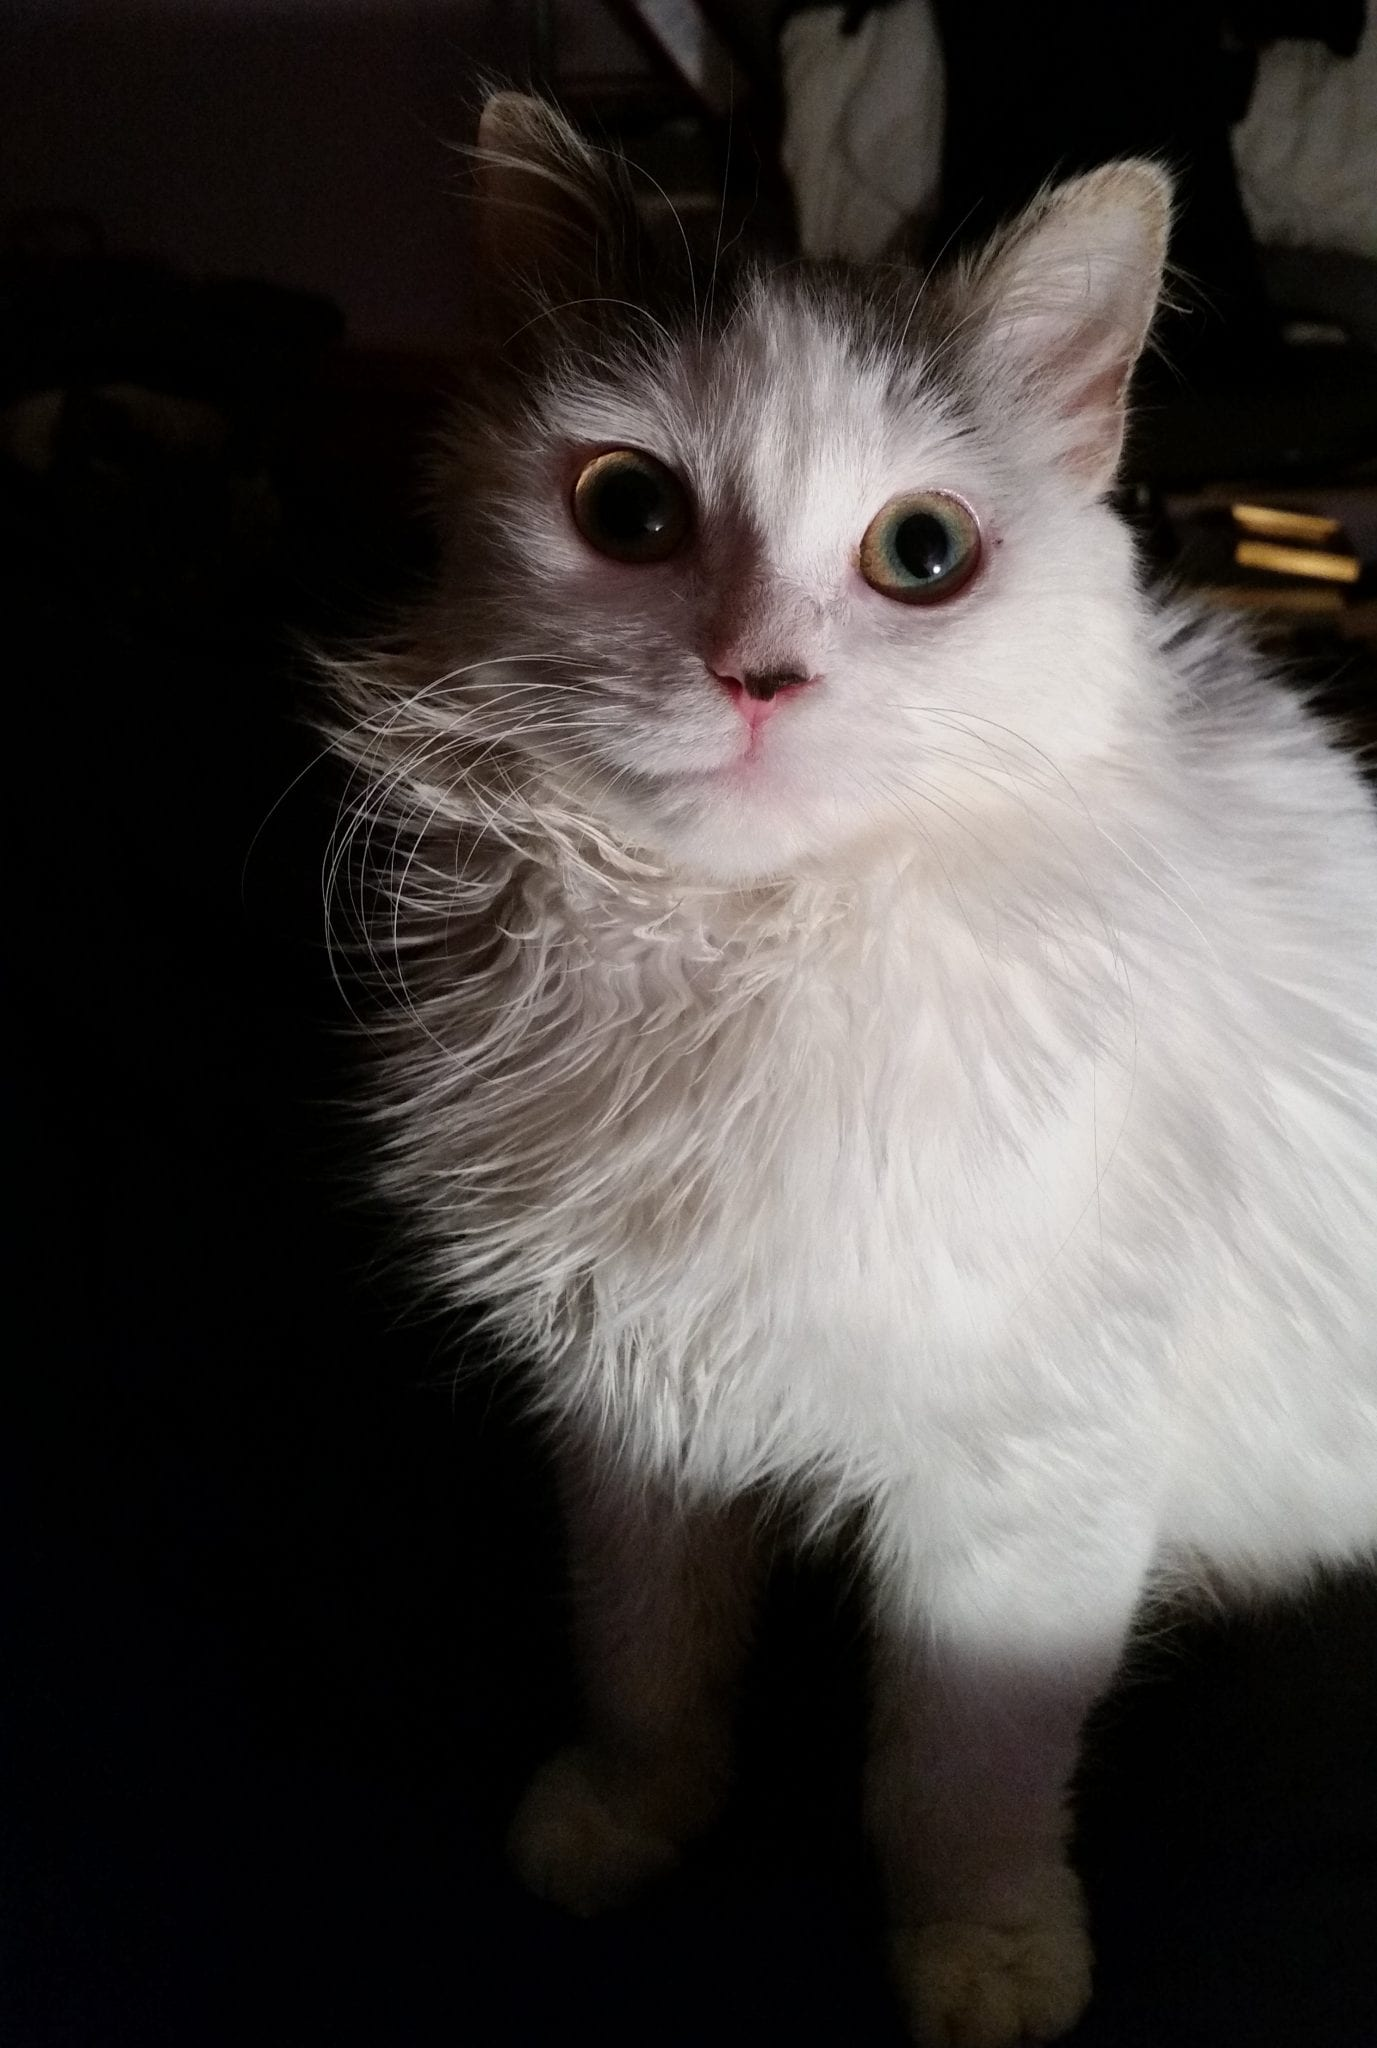 cute kittten